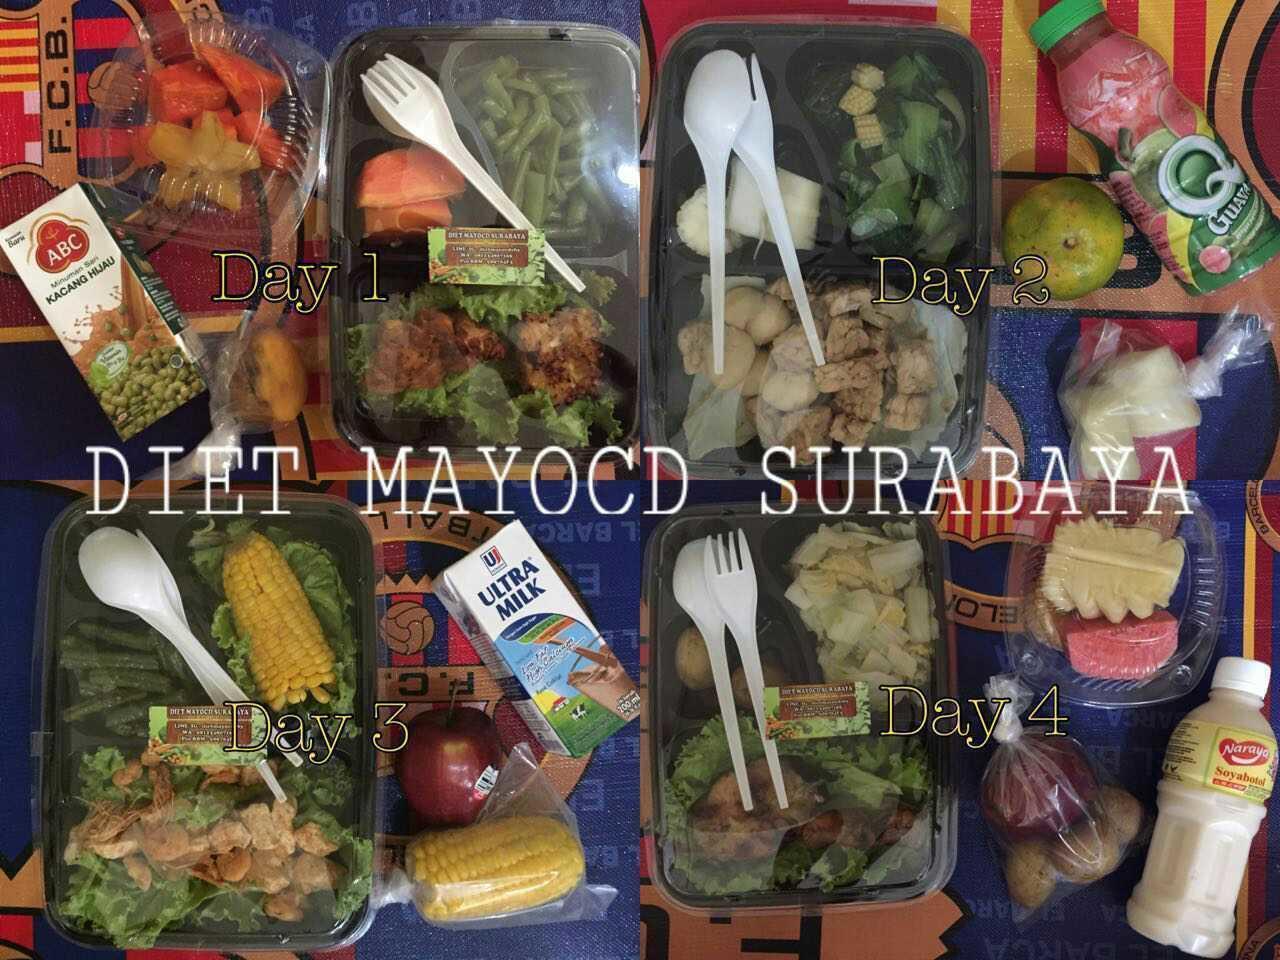 DietMayoCD Surabaya